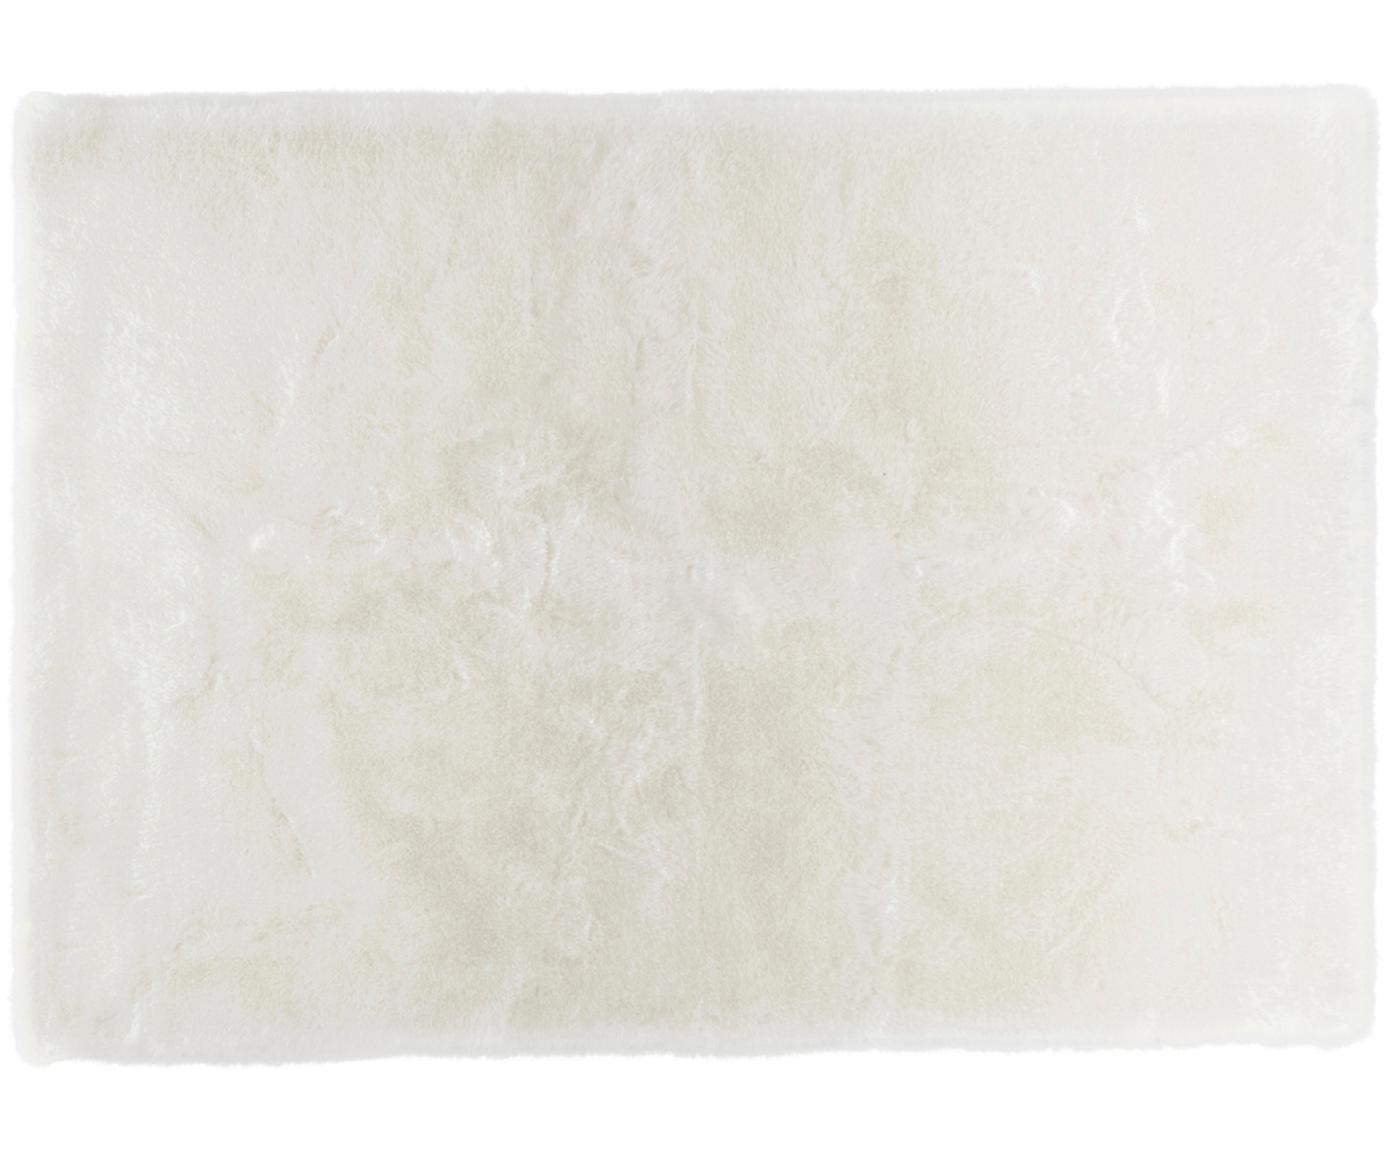 Flauschiger Hochflor-Teppich Superior aus Kunstfell, Flor: 95% Acryl, 5% Polyester, Weiß, B 120 x L 170 cm (Größe S)